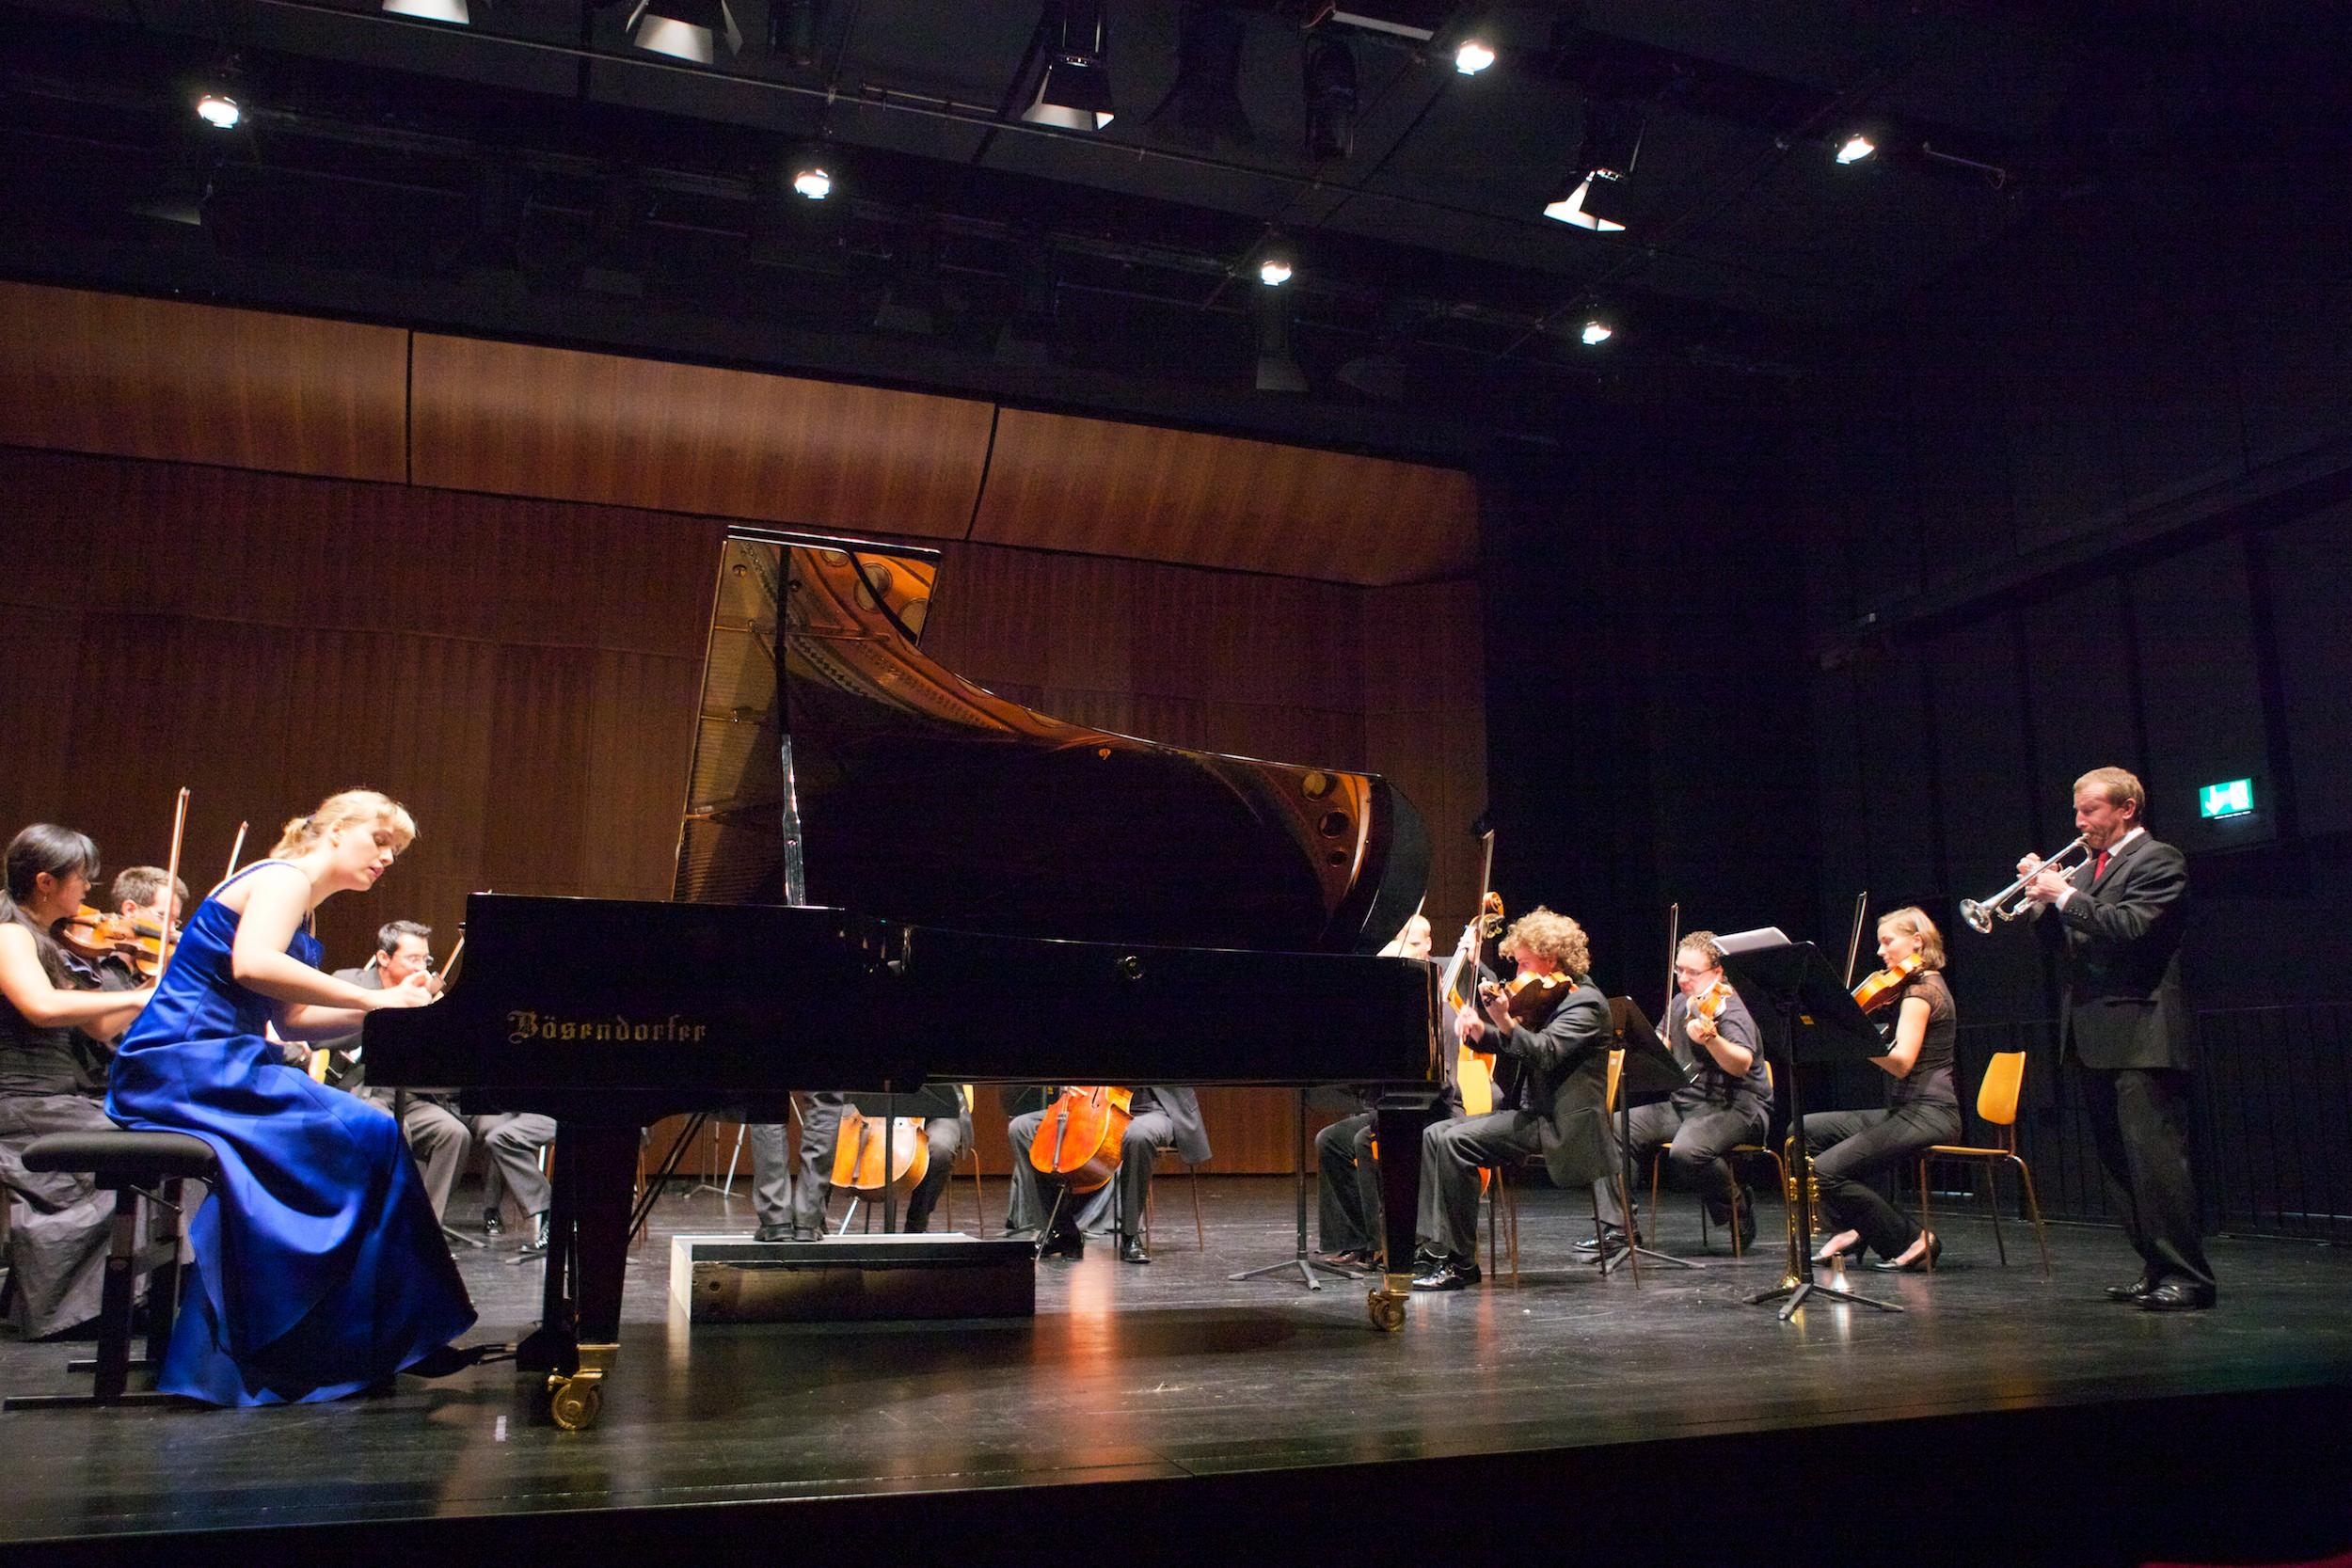 performing Shostakovich 1st Concerto